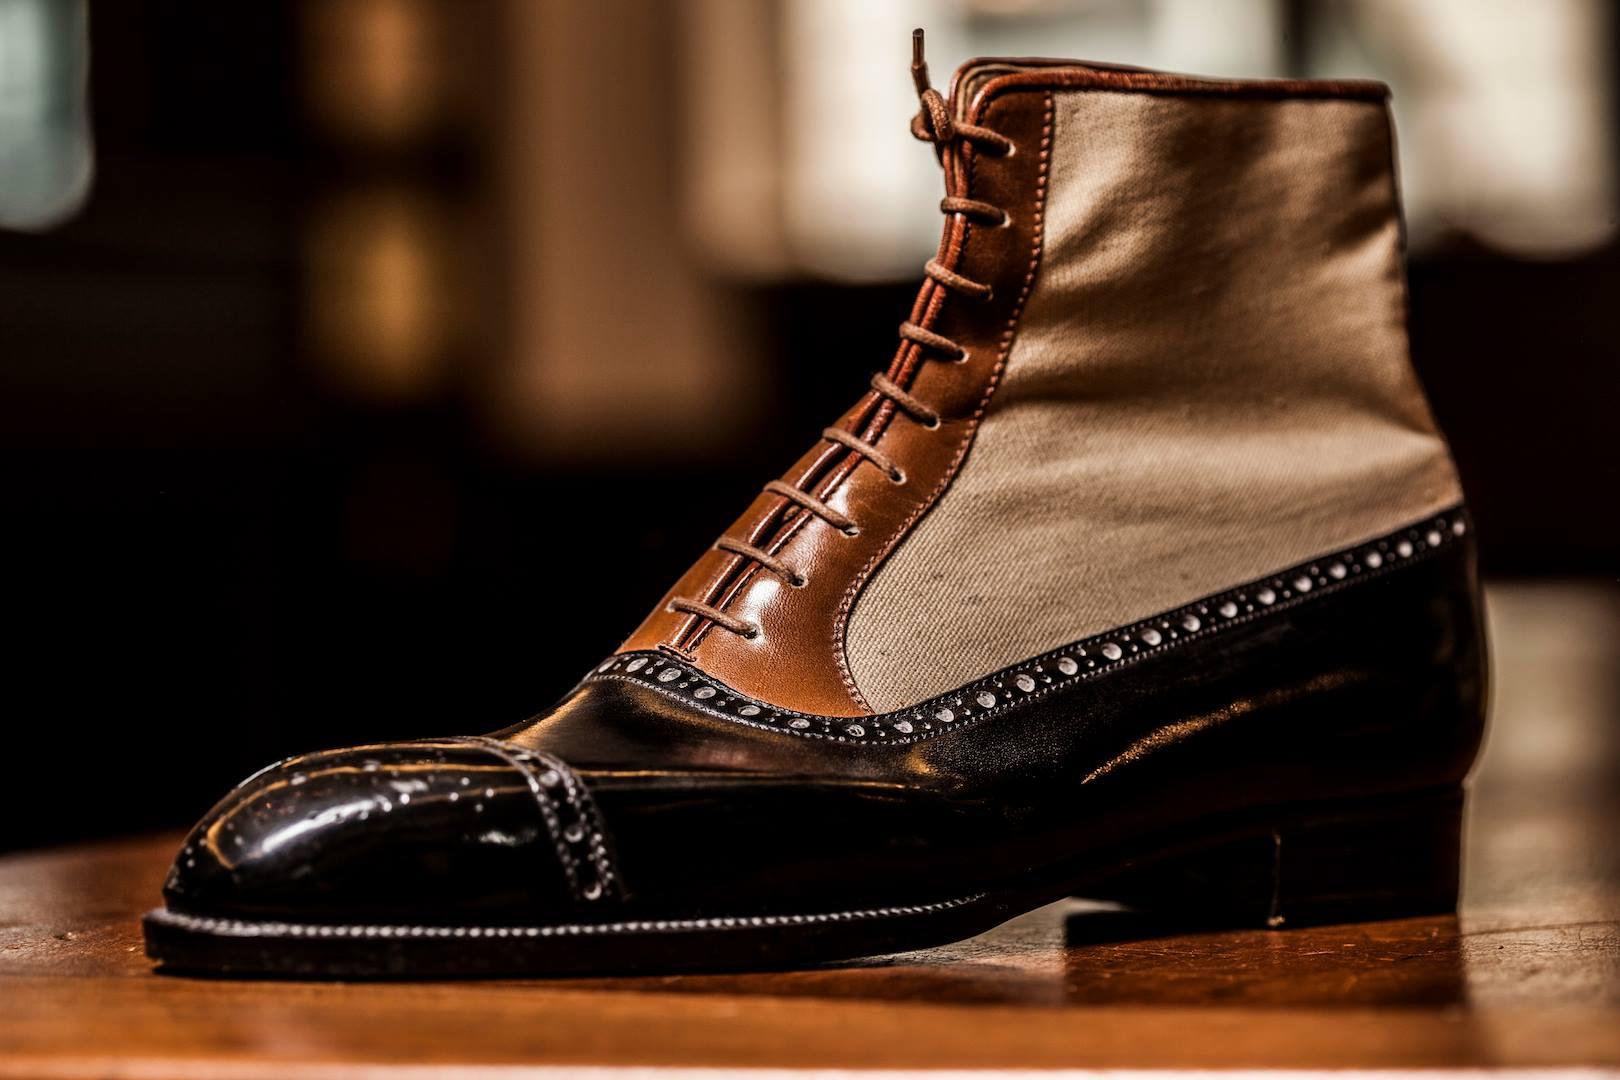 Dimitri Gomez Bespoke Balmoral Boot The Shoe Snob Blog